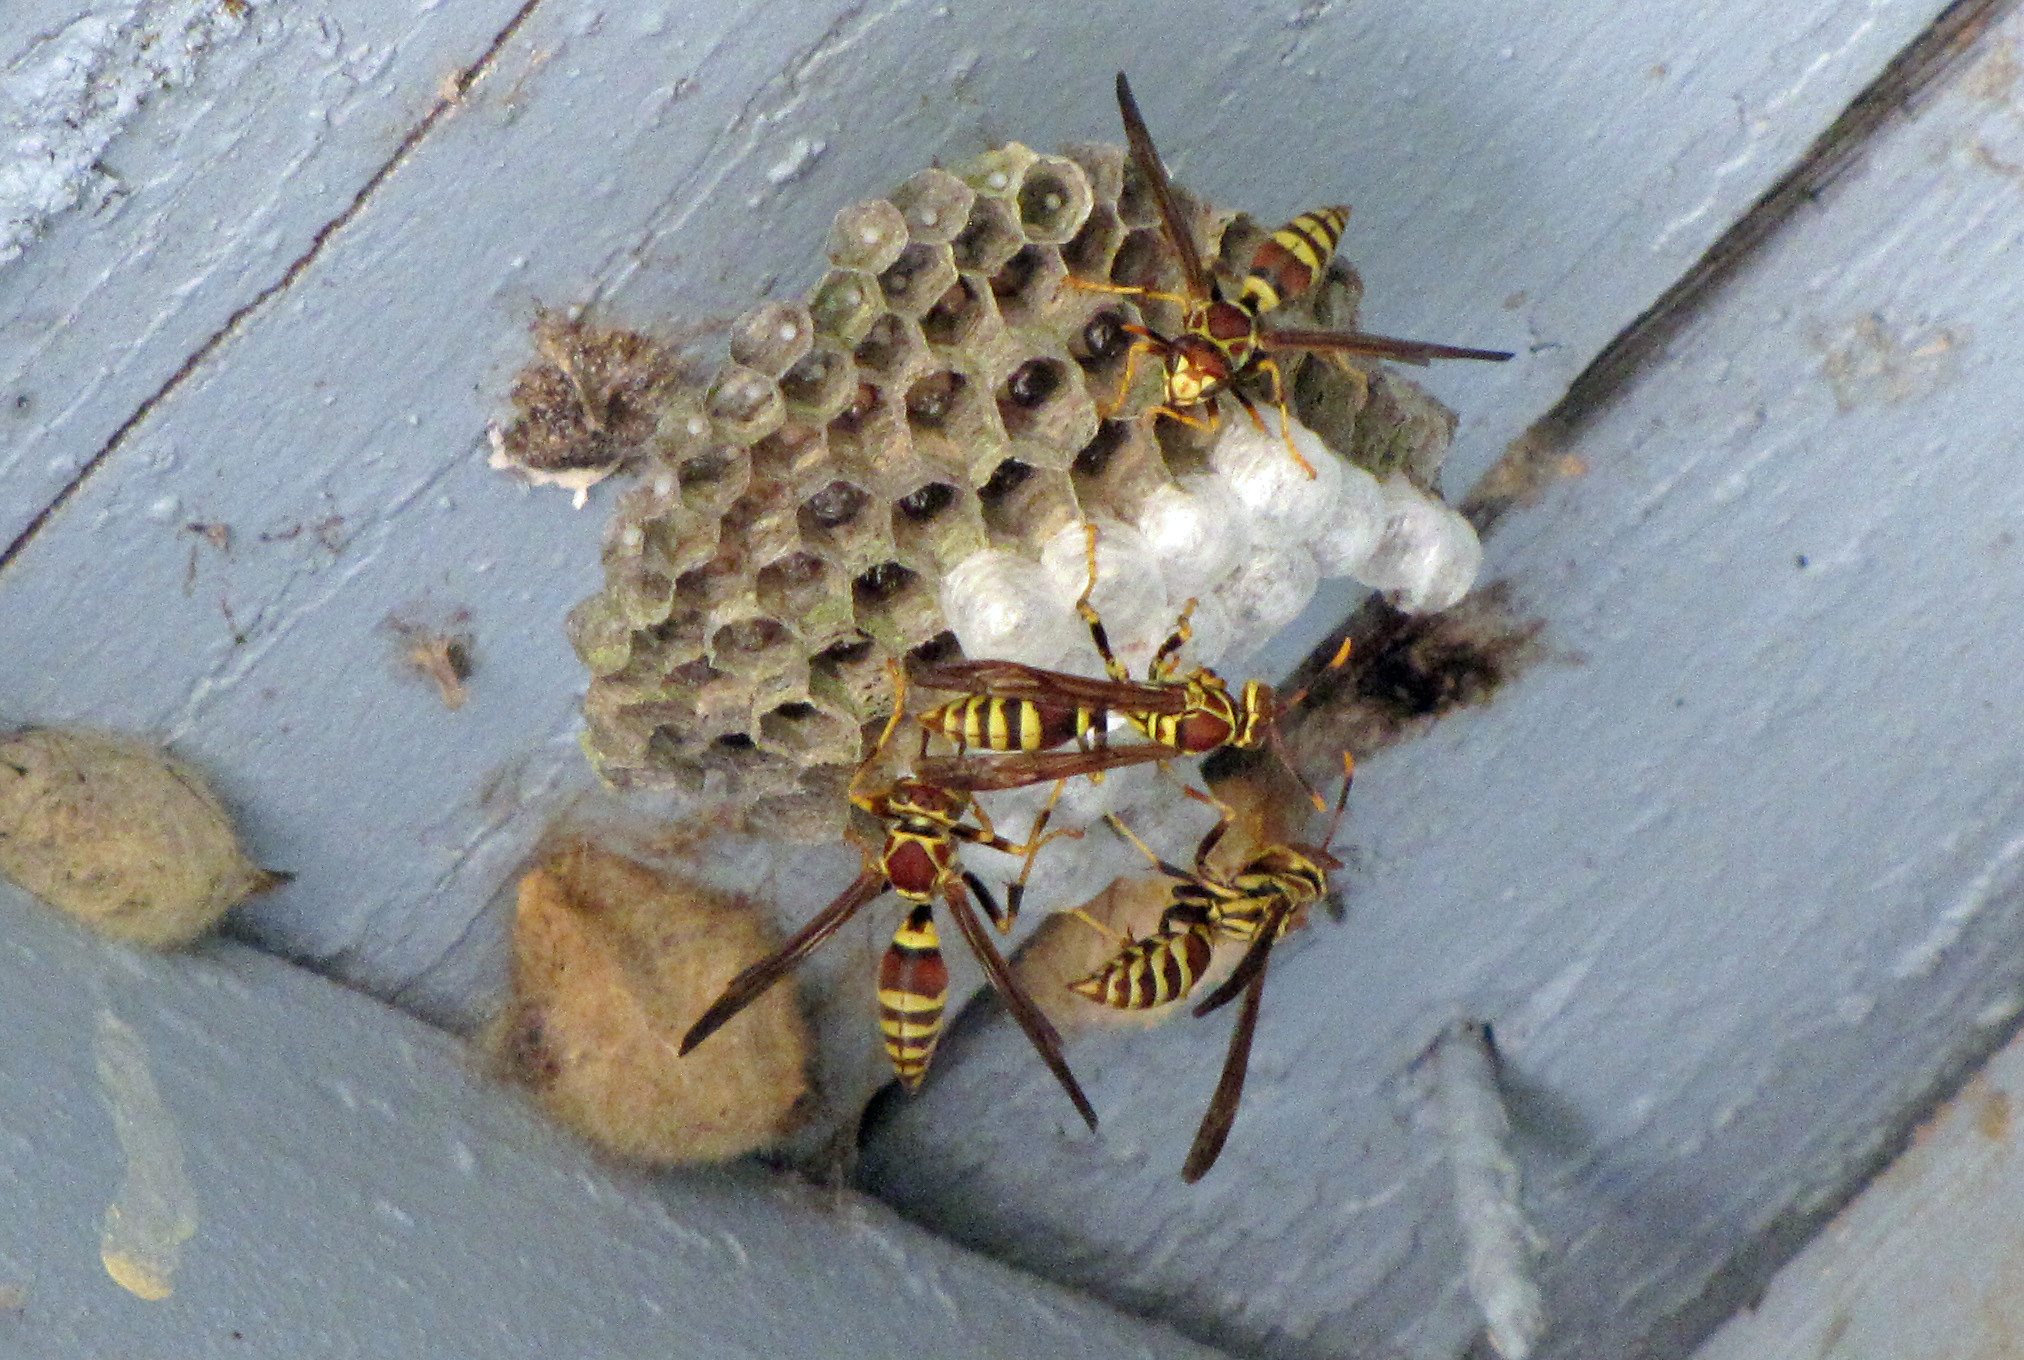 Wasps Killing Caterpillars Four String Farm